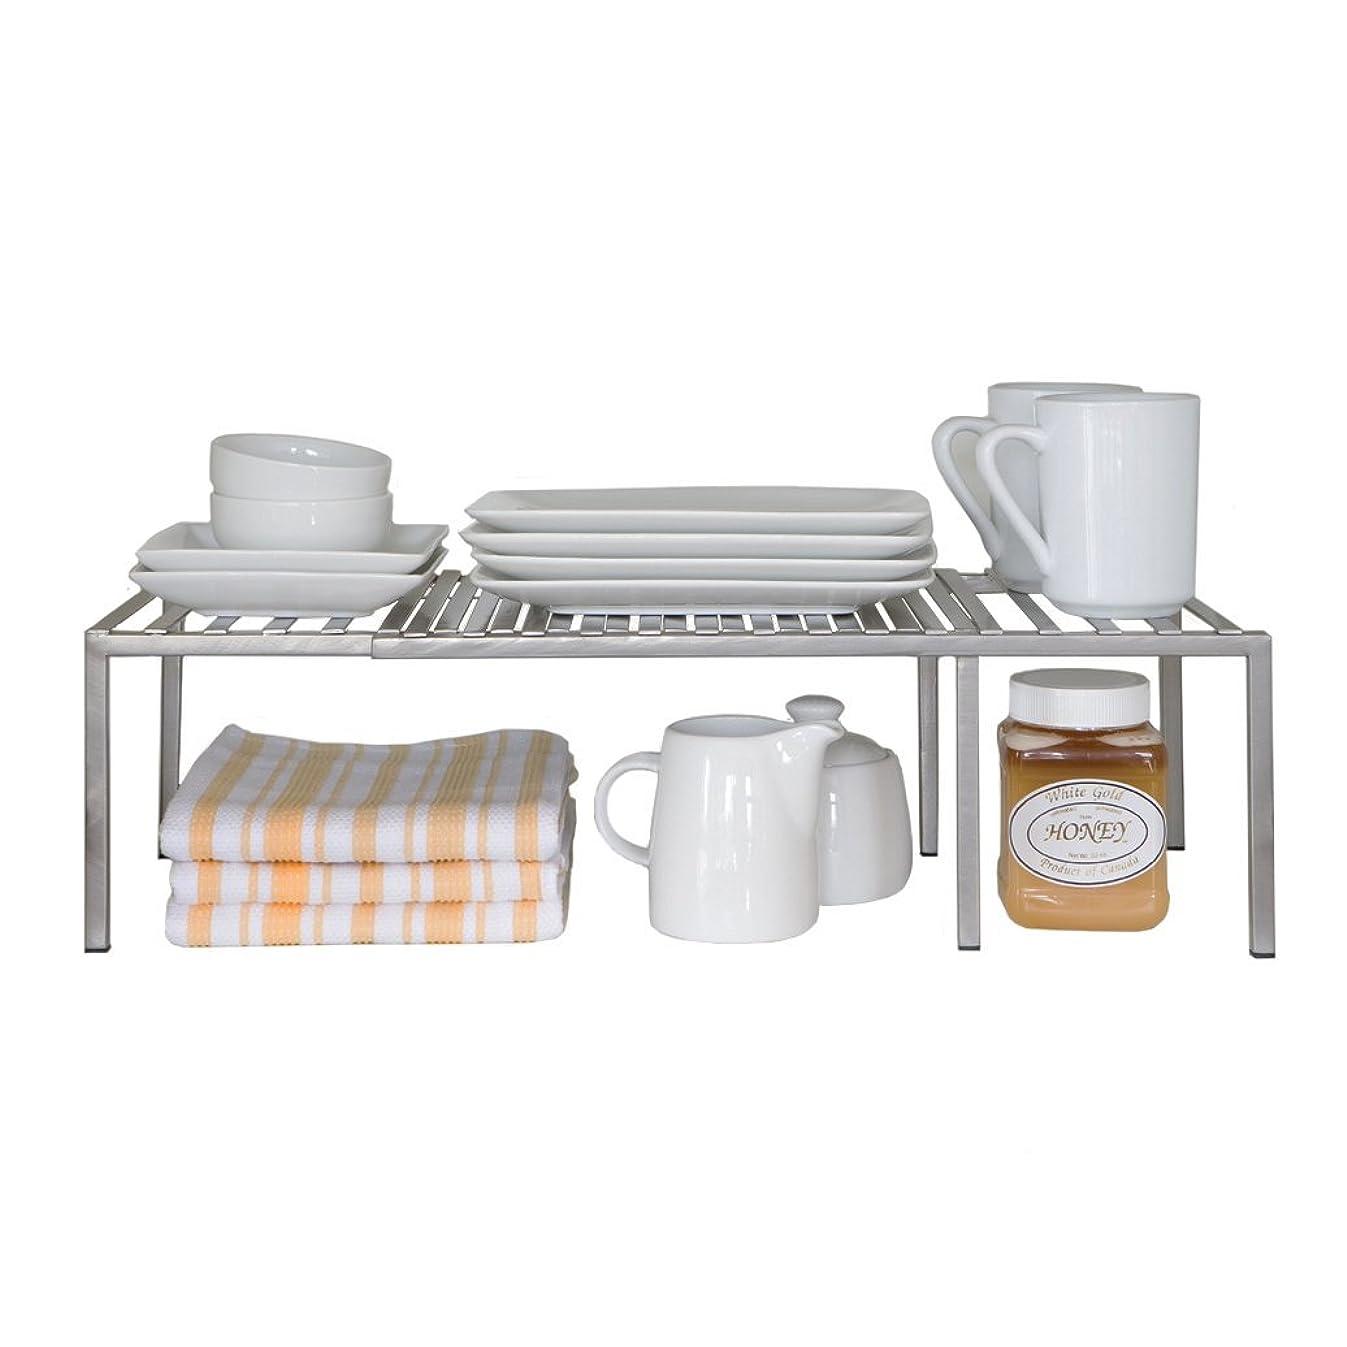 Seville Classics Iron Slat Expandable Kitchen Counter and Cabinet Shelf, Satin Pewter